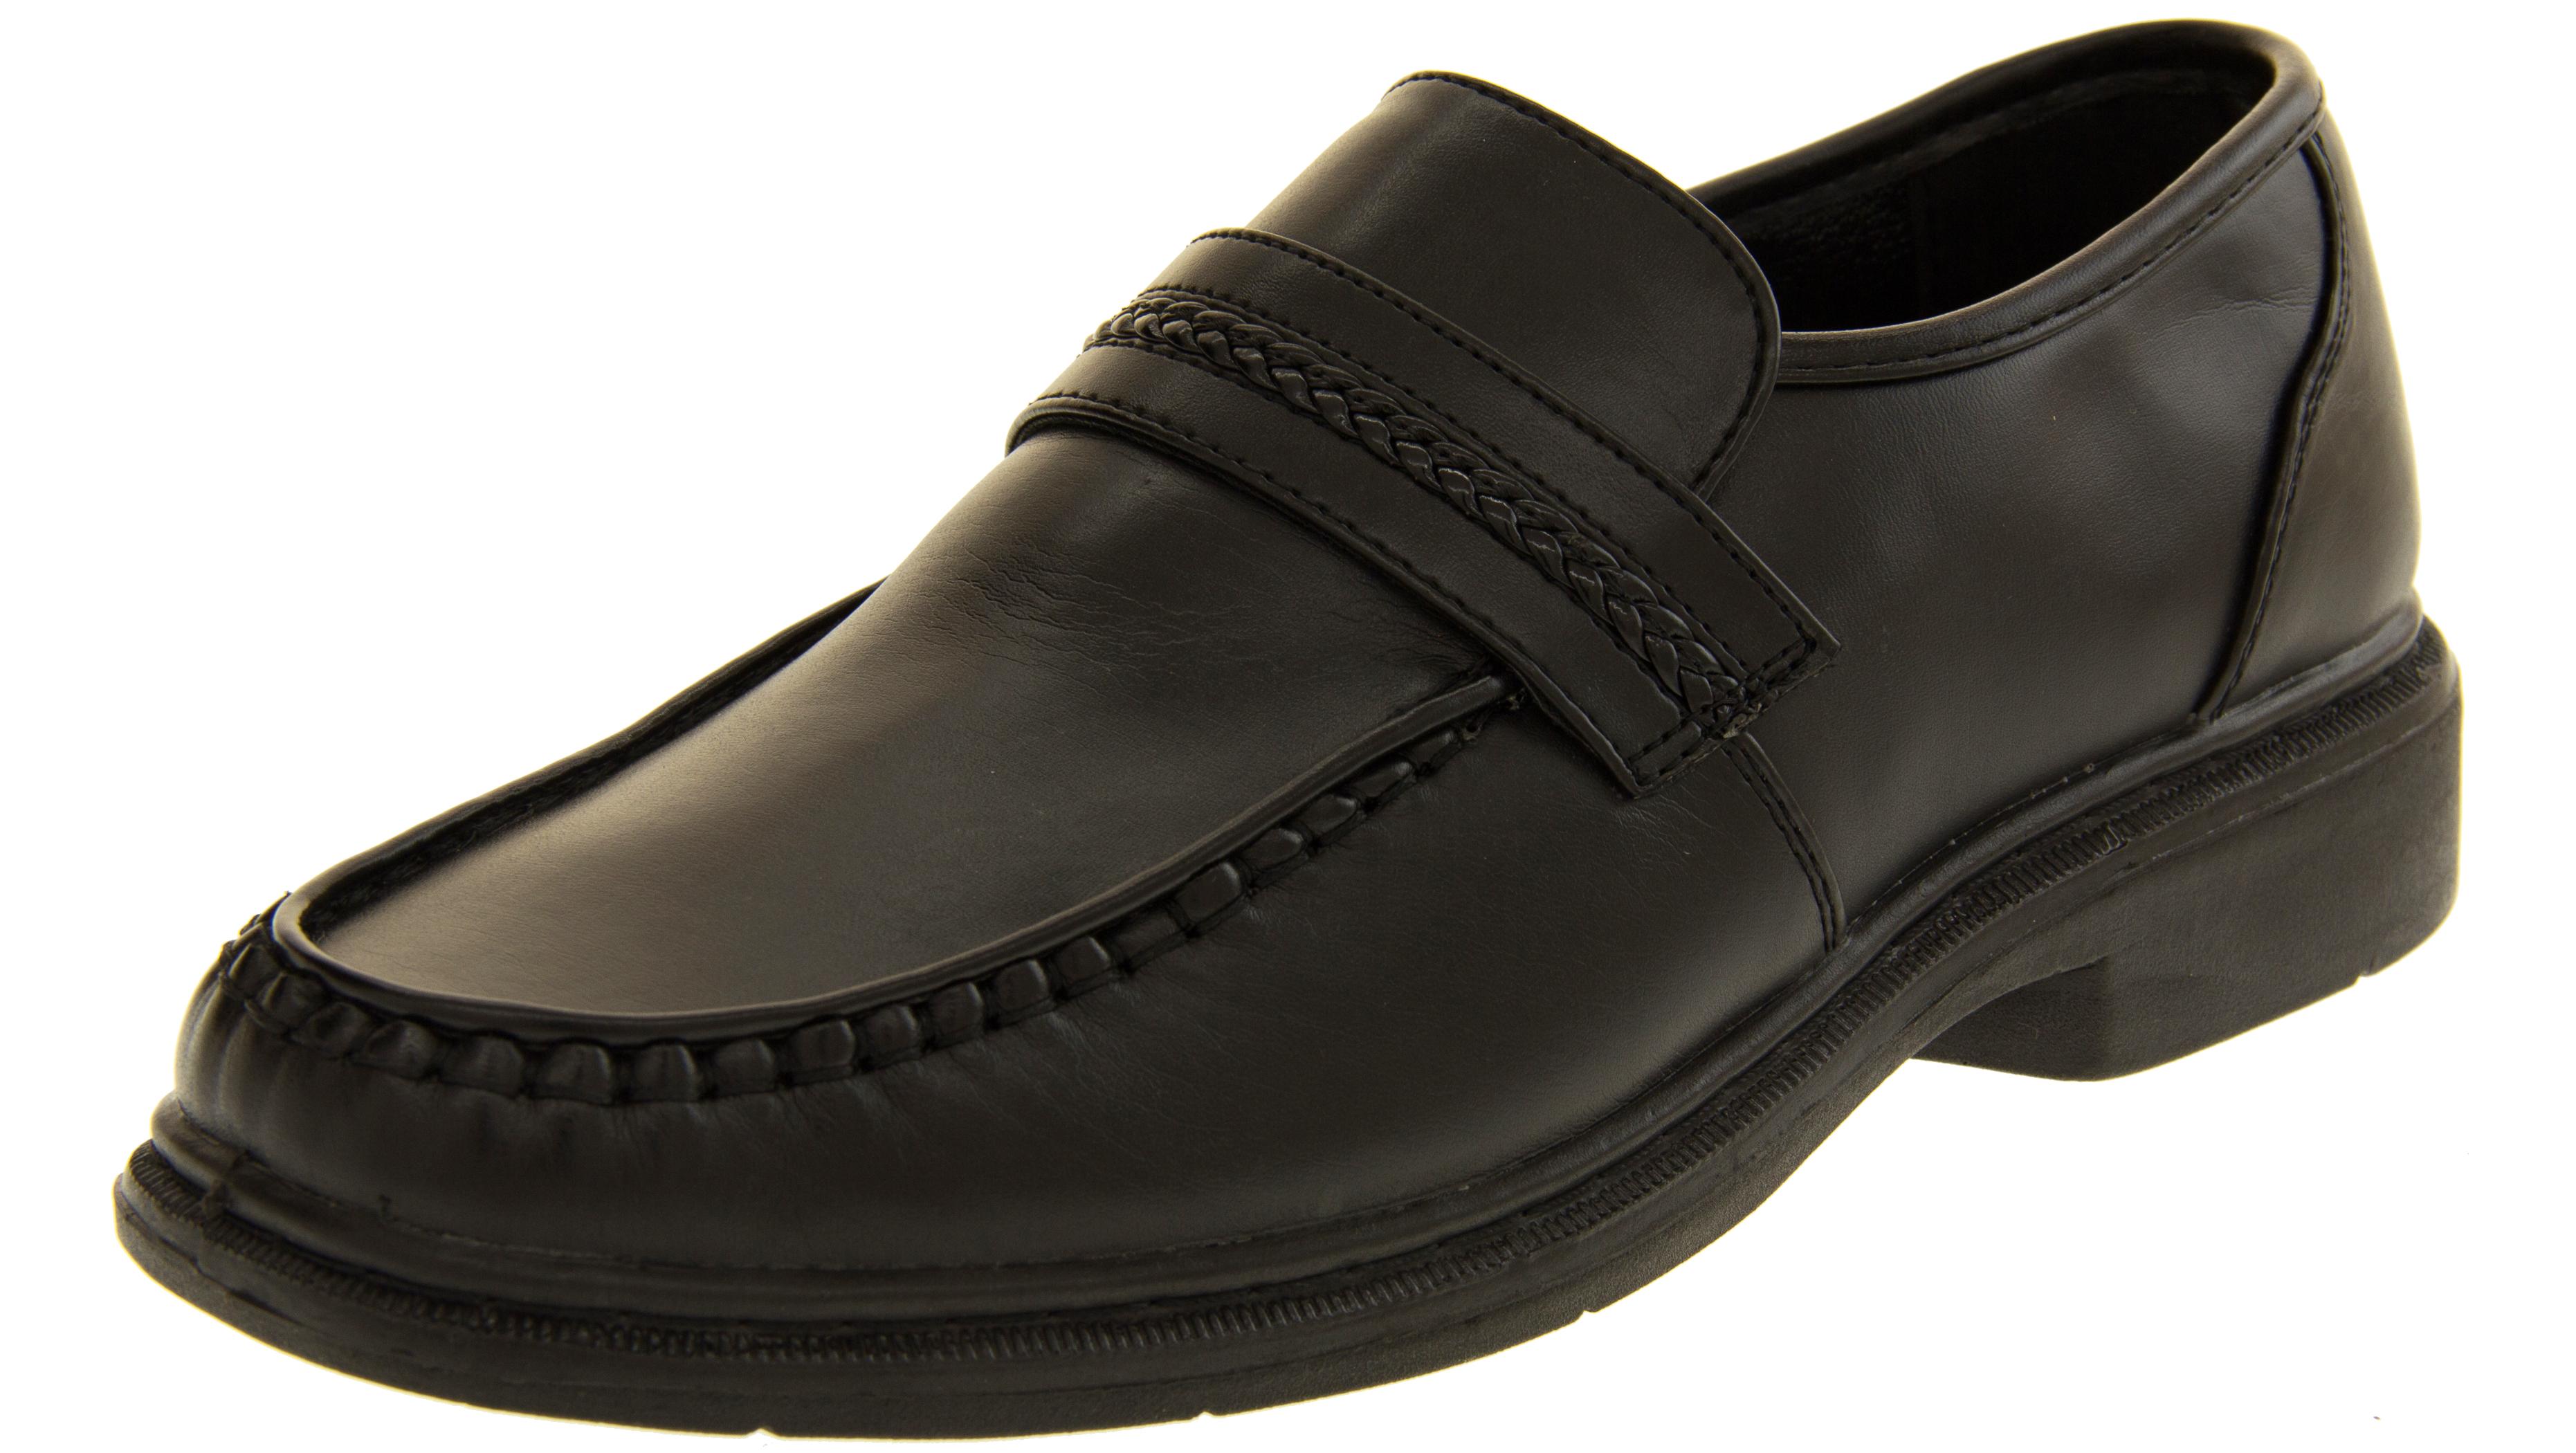 Boys School Shoes Slip Ons